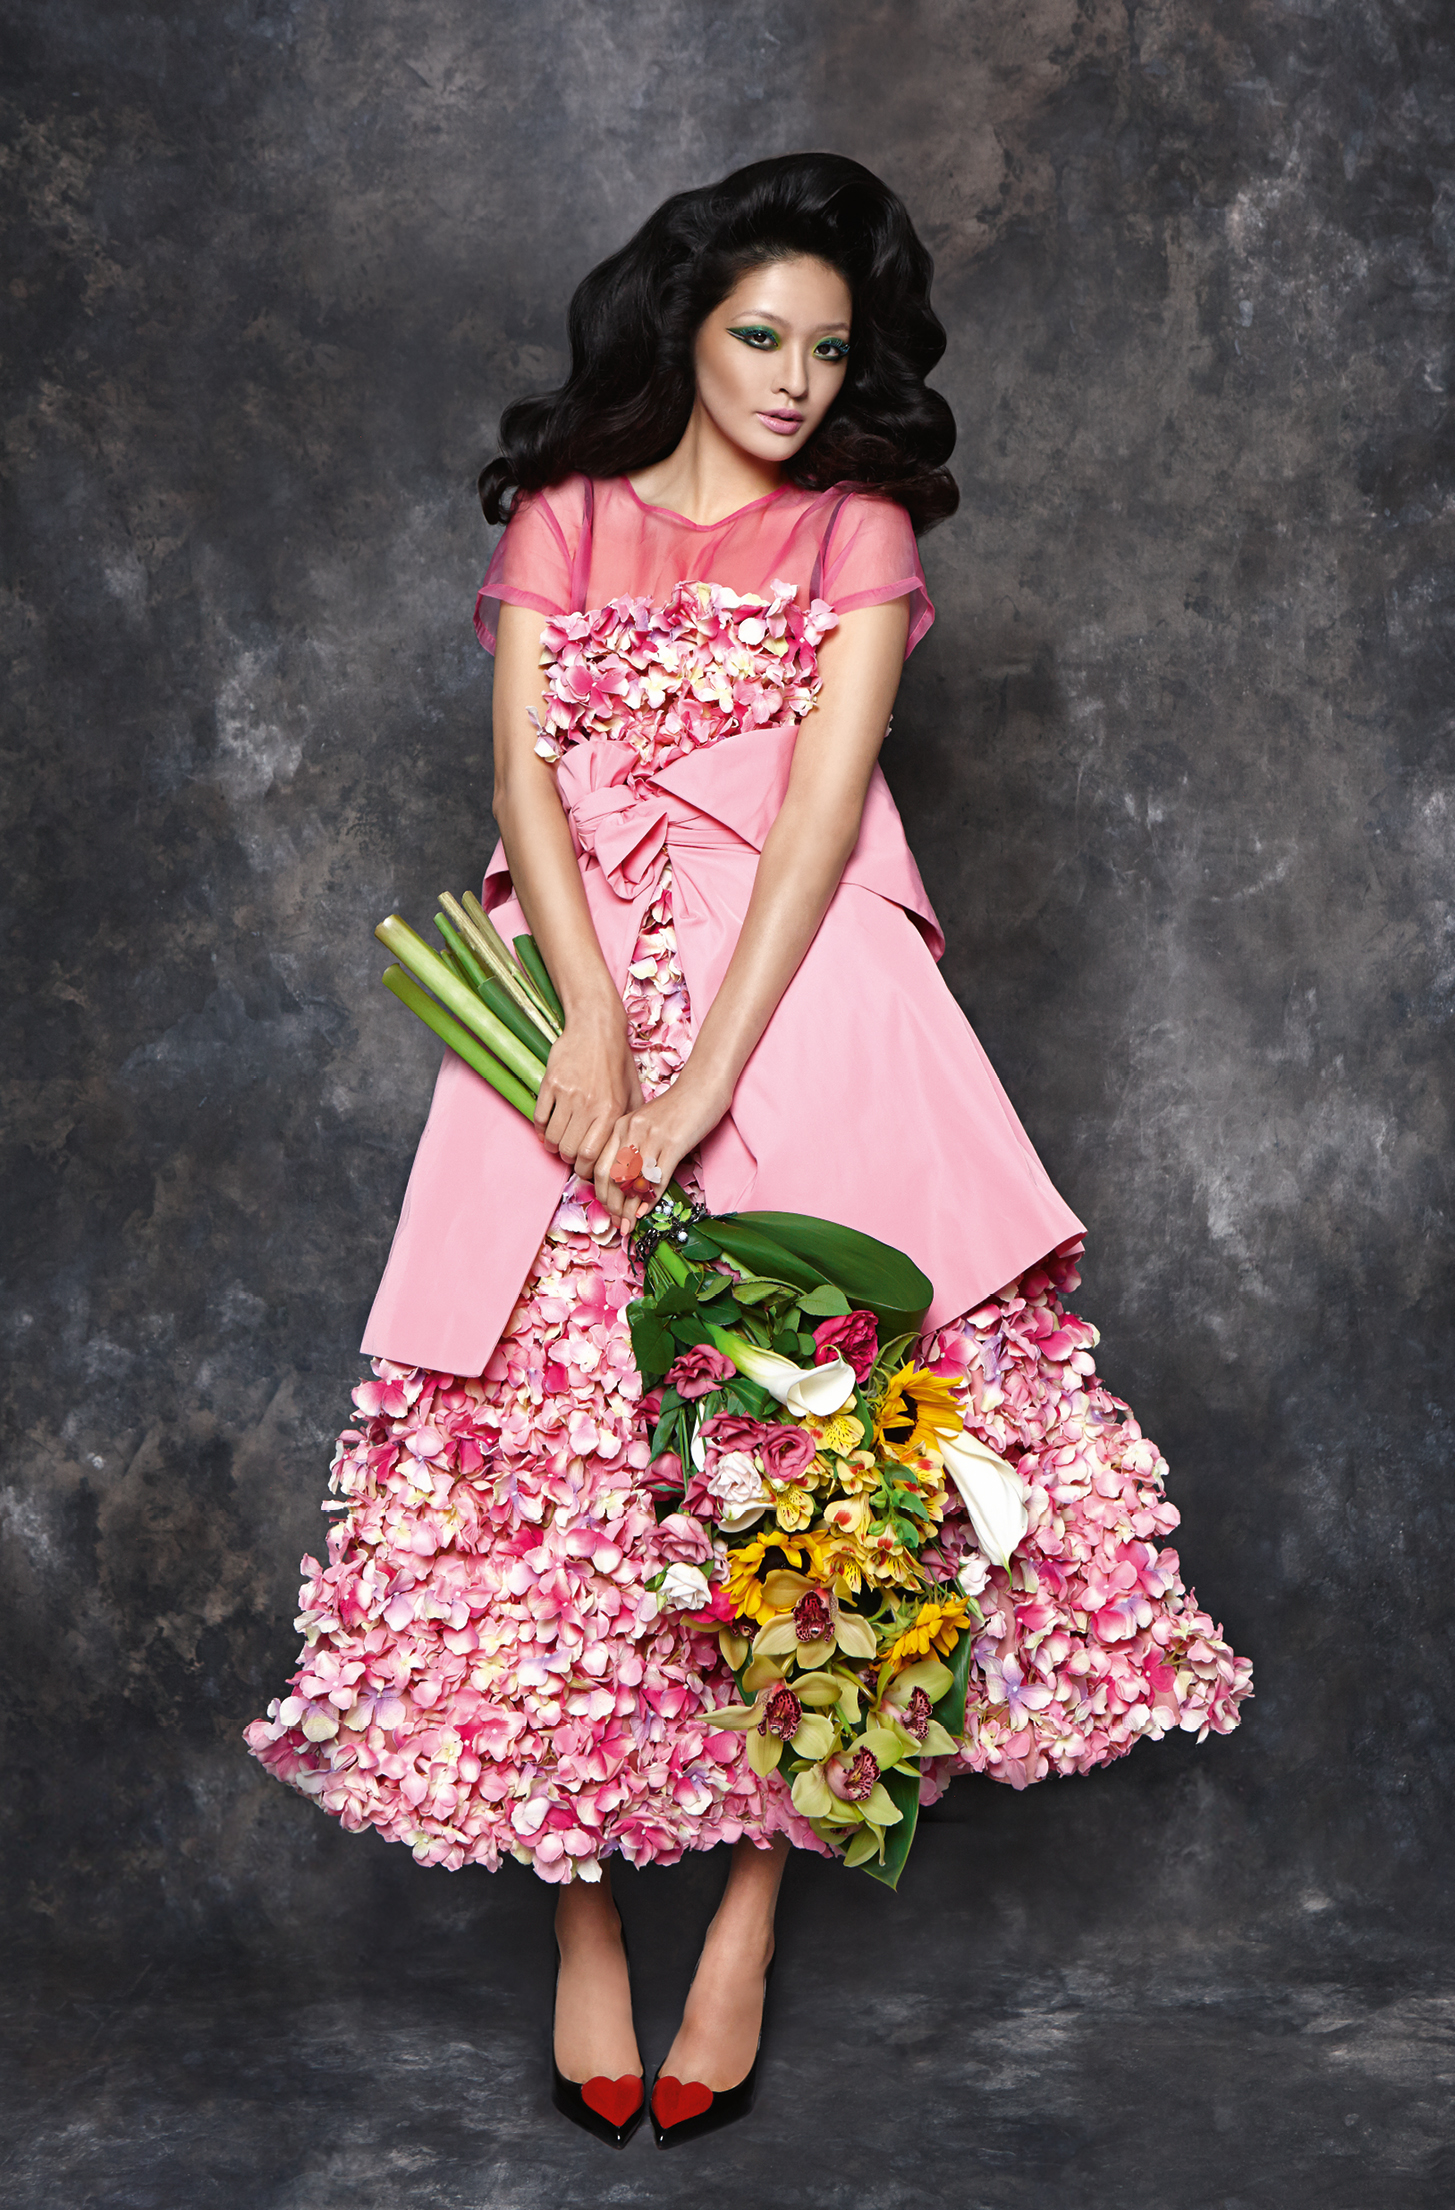 Flower dress,  Zeynep Kartel.  Pink coat (tied around waist),  Moschino   Cheap & Chic.  Pink sheer top,  2nd Day.  Sheer stockings,  Mrs Miller.  Flower ring,  Tatty Devine.  Black heart stilettos,  Christian Louboutin.  Bracelet (attached to flowers),  Mawi.